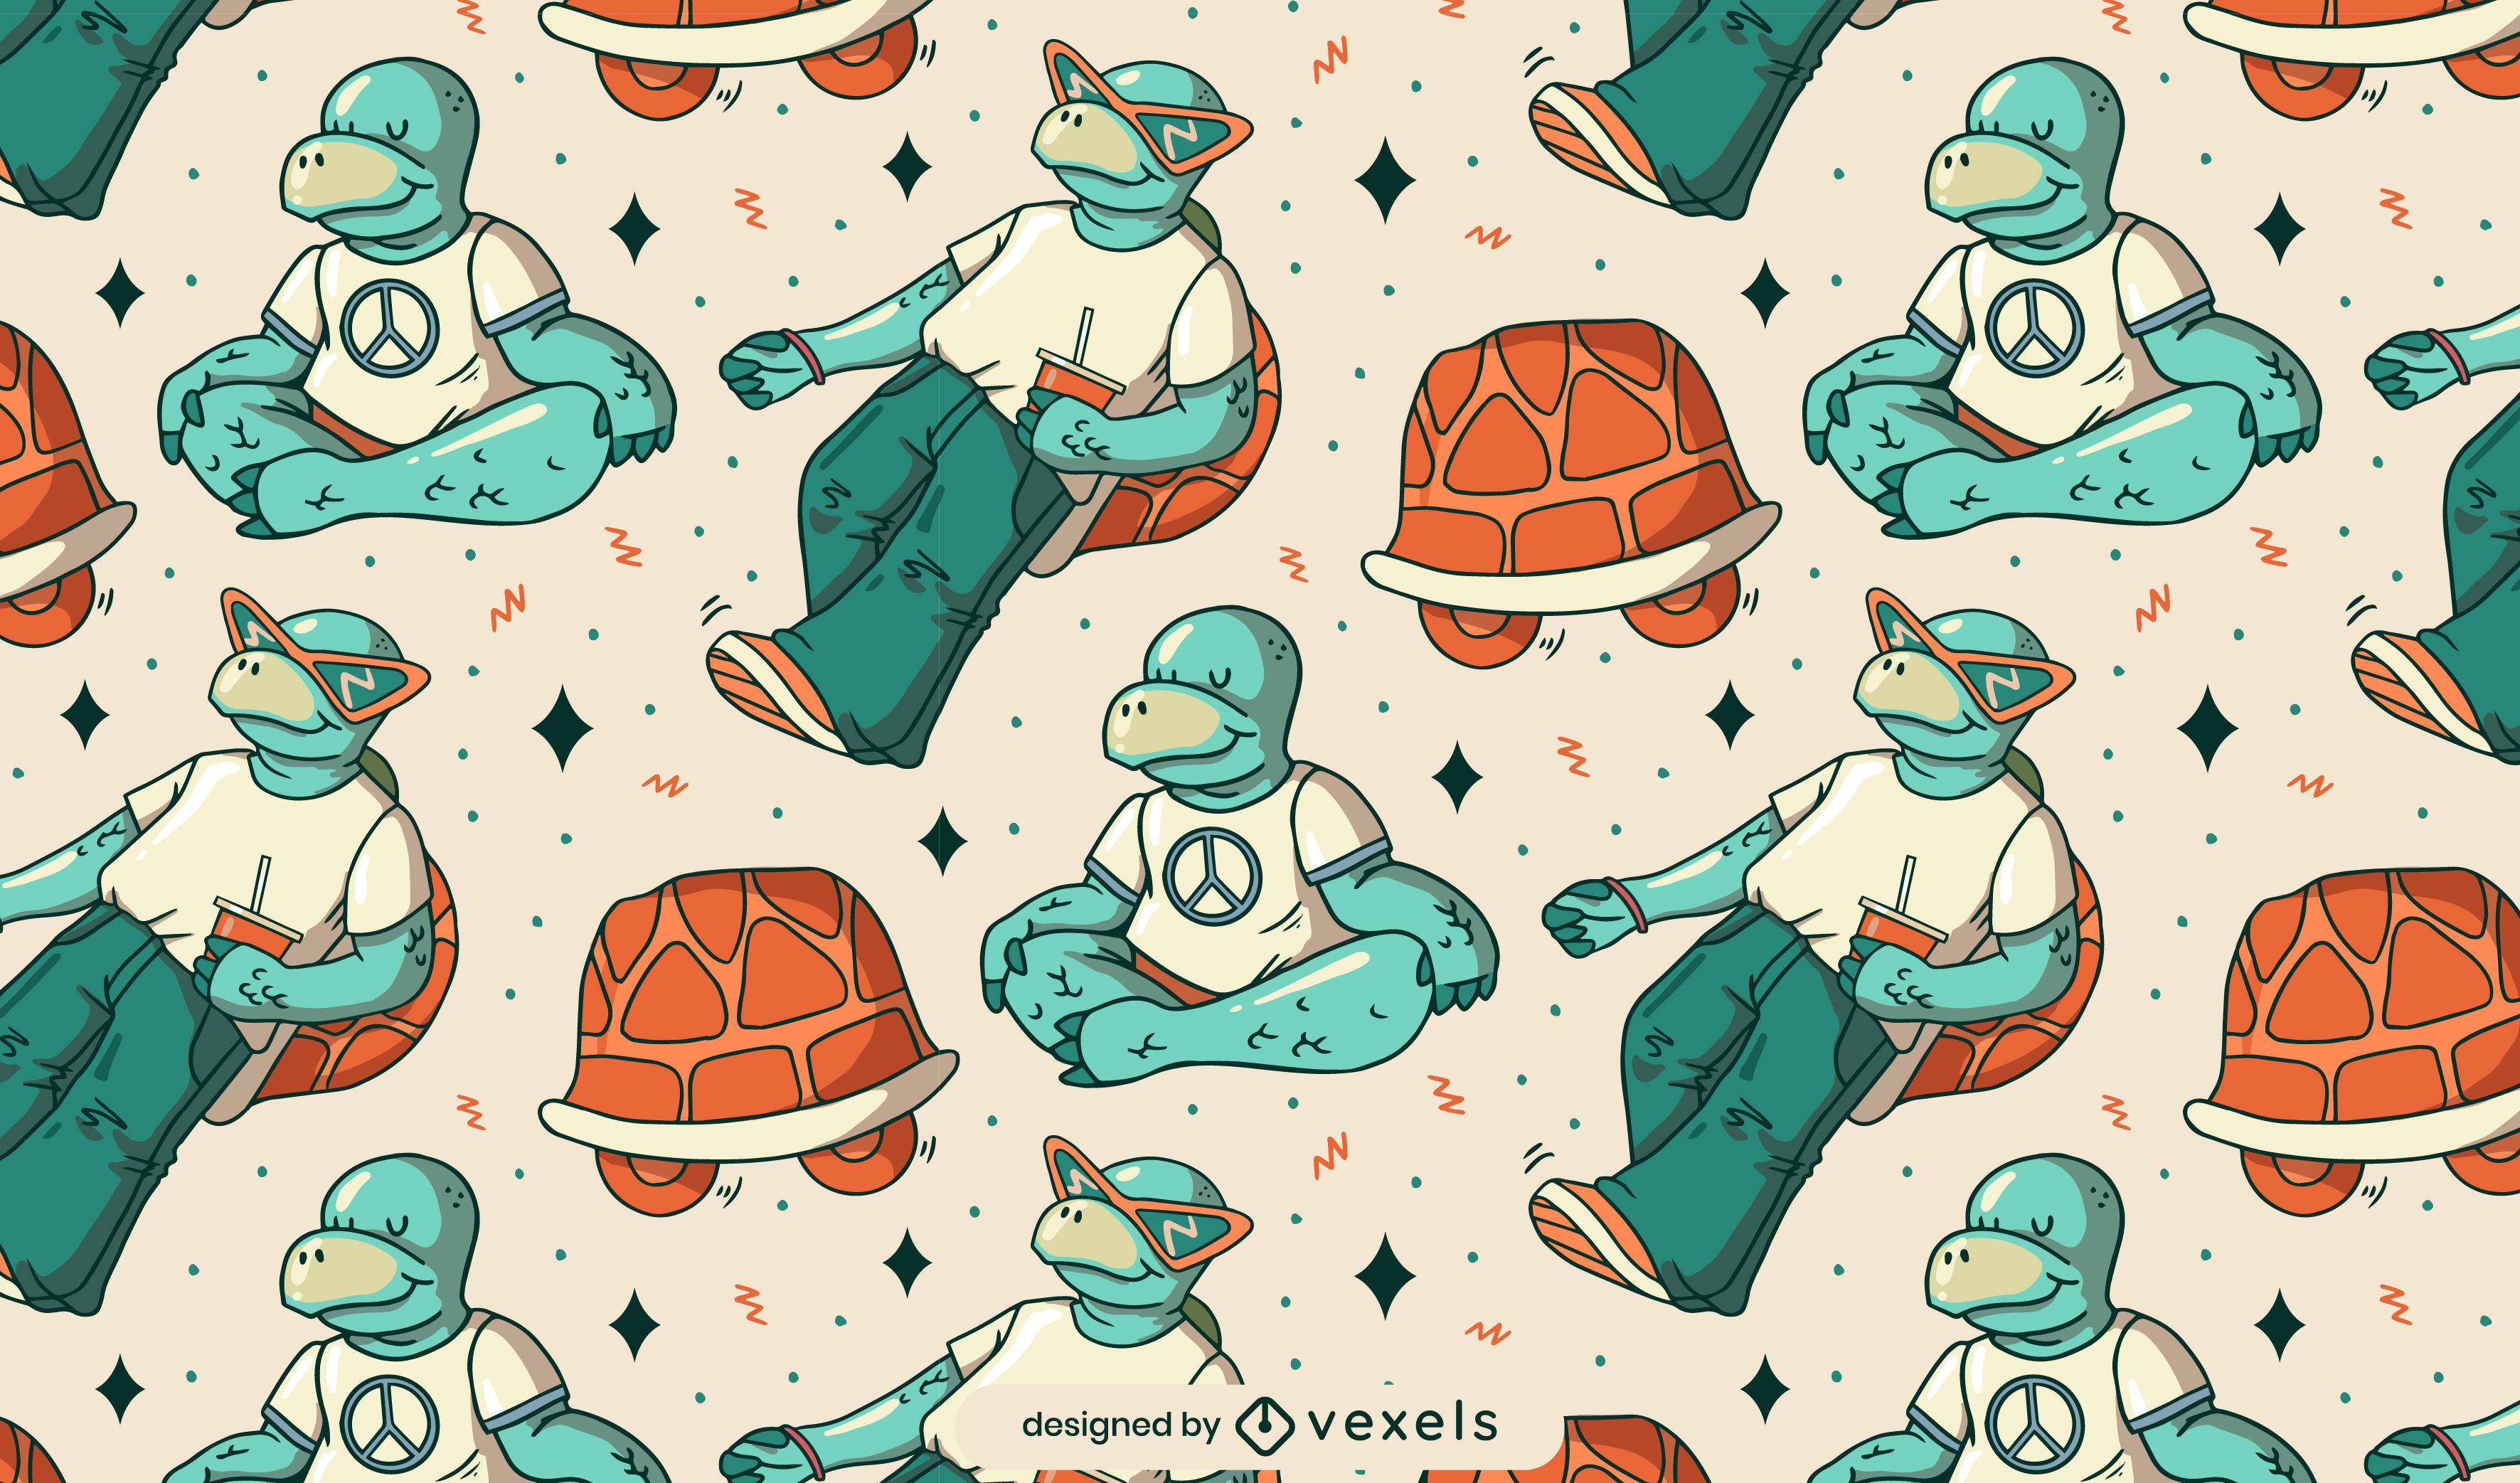 Dise?o de patr?n de personajes de tortuga de dibujos animados